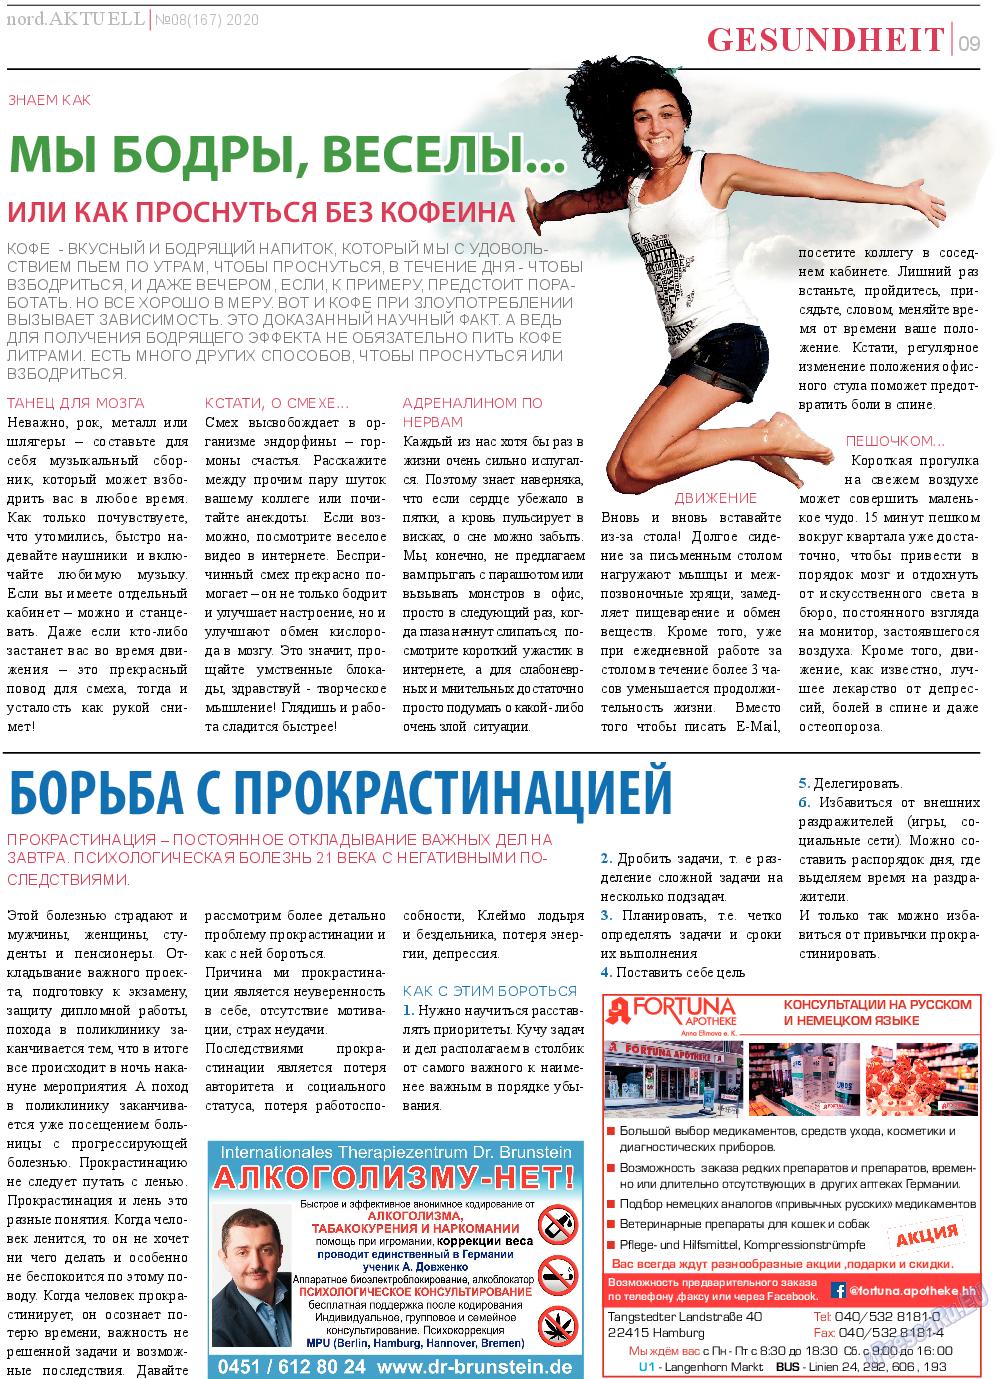 nord.Aktuell (газета). 2020 год, номер 8, стр. 9